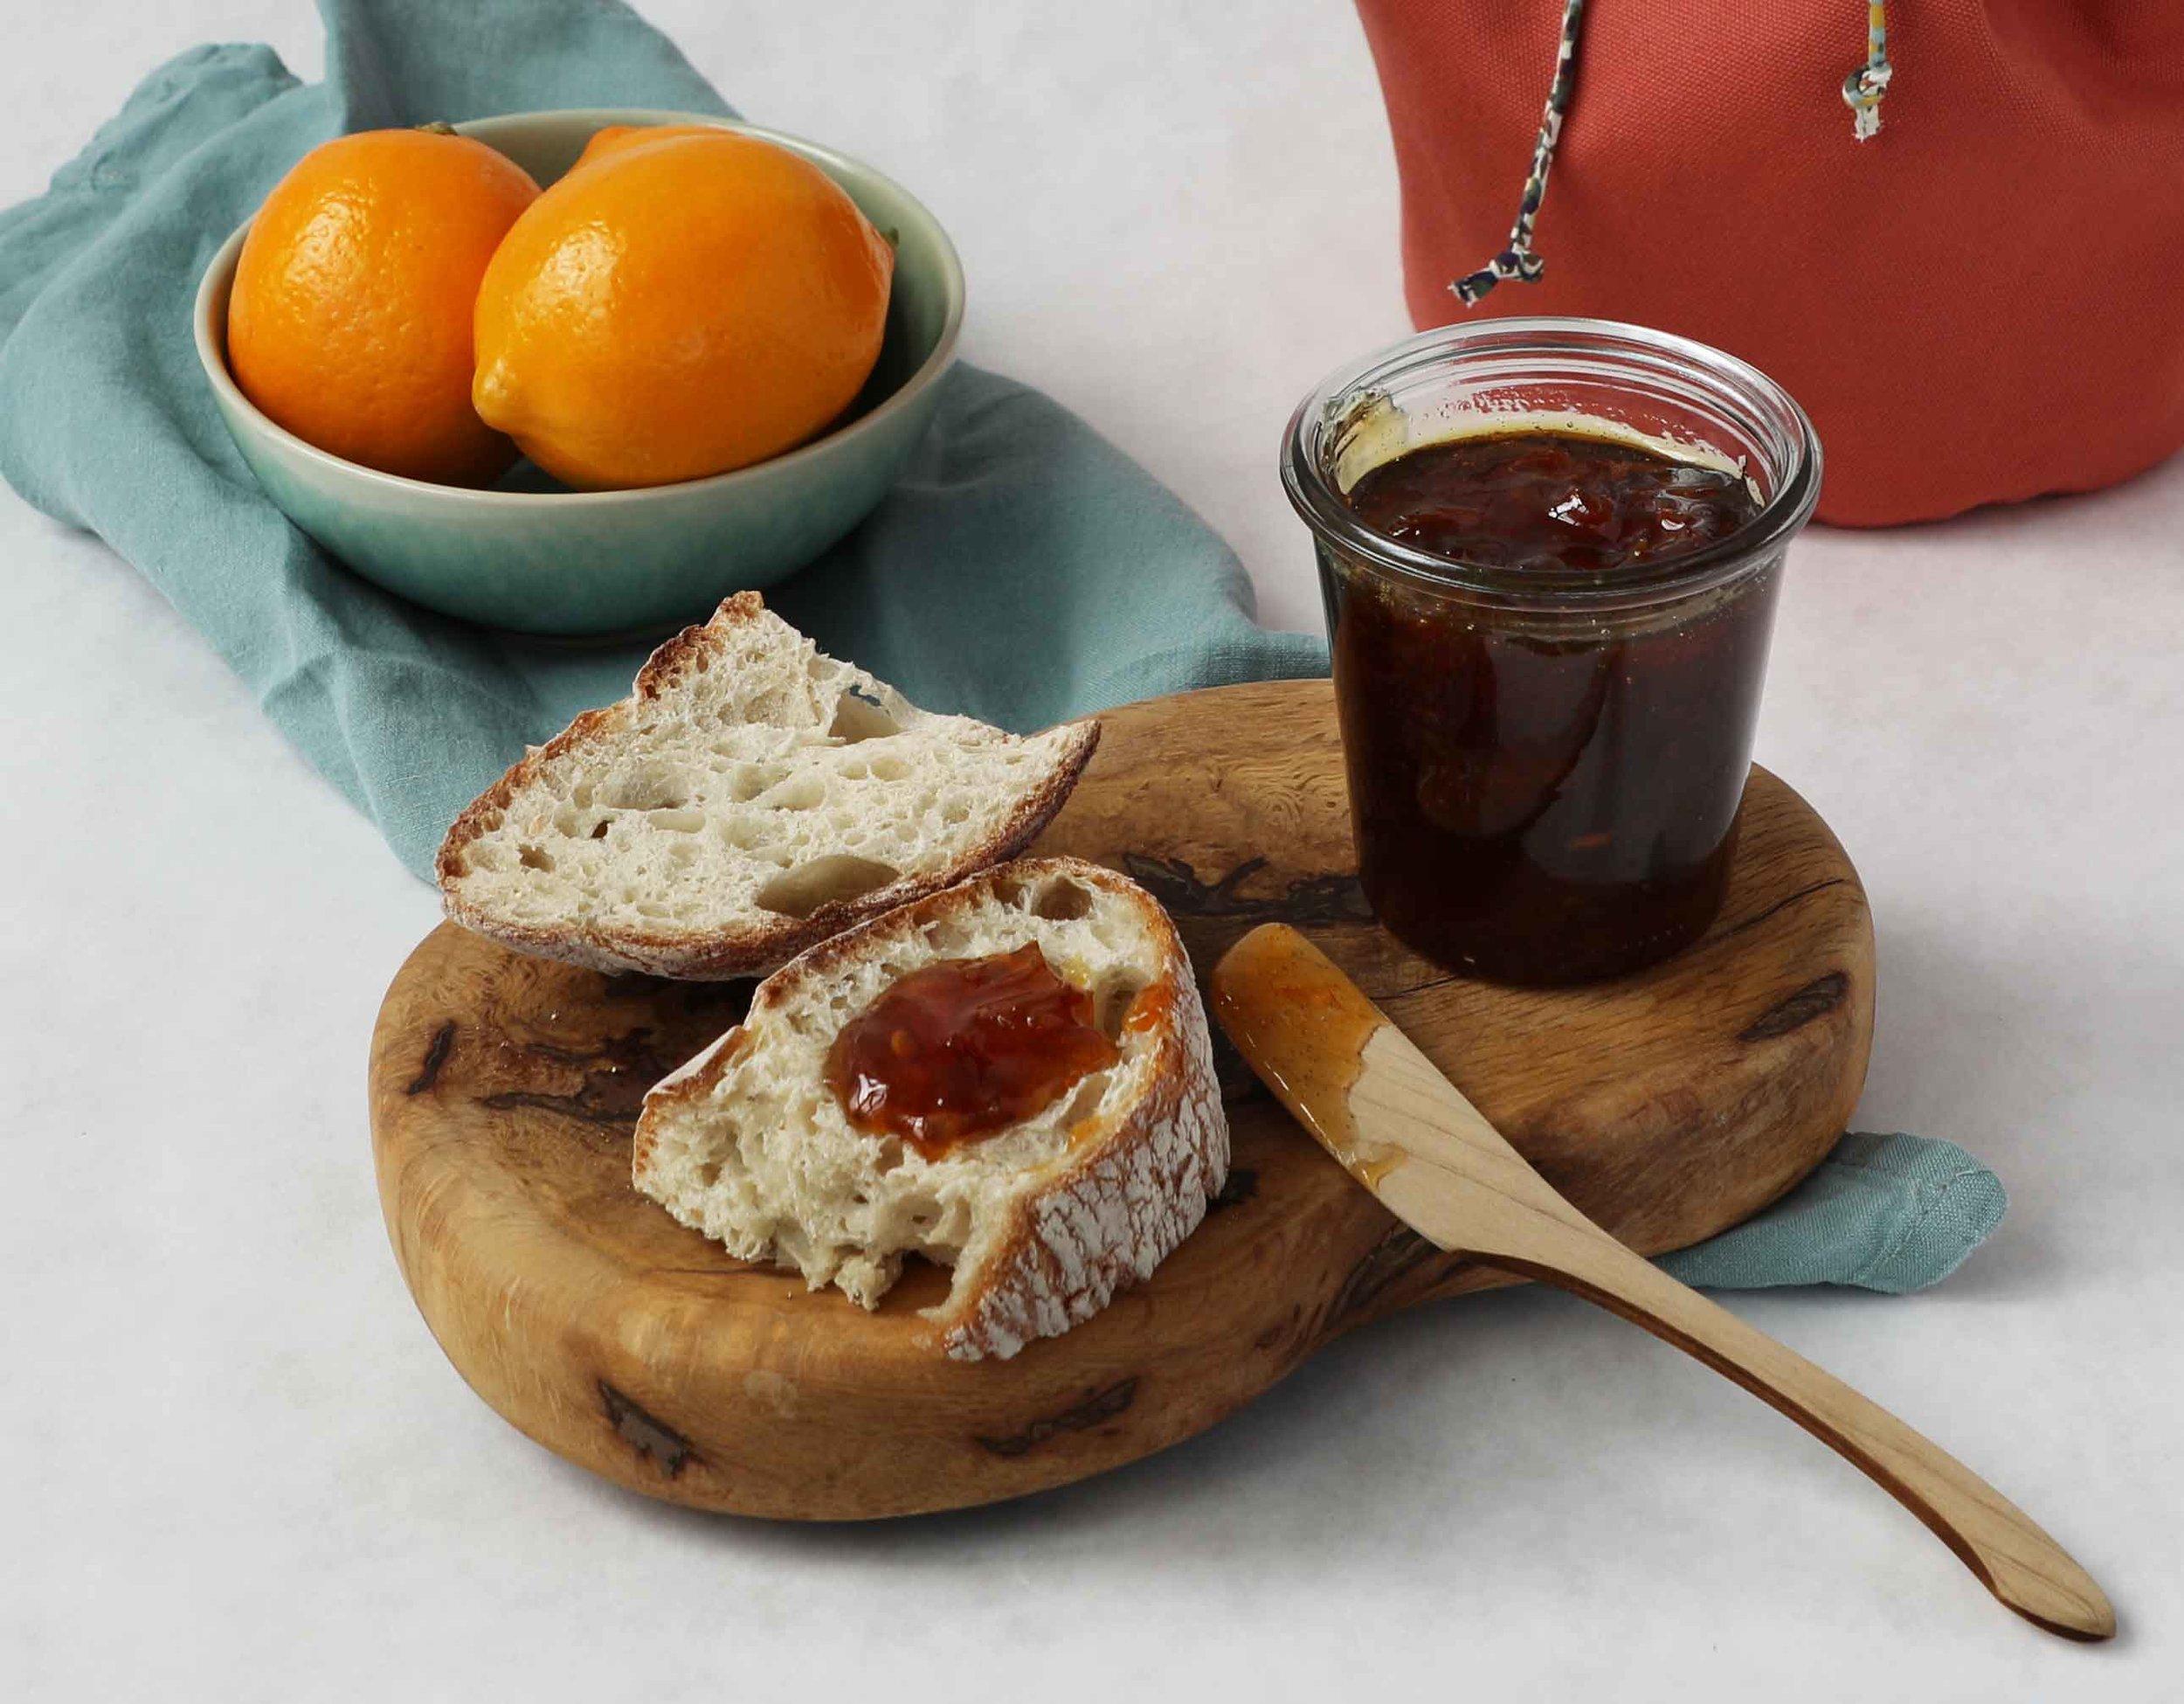 marmalade-scene-closeup.jpg